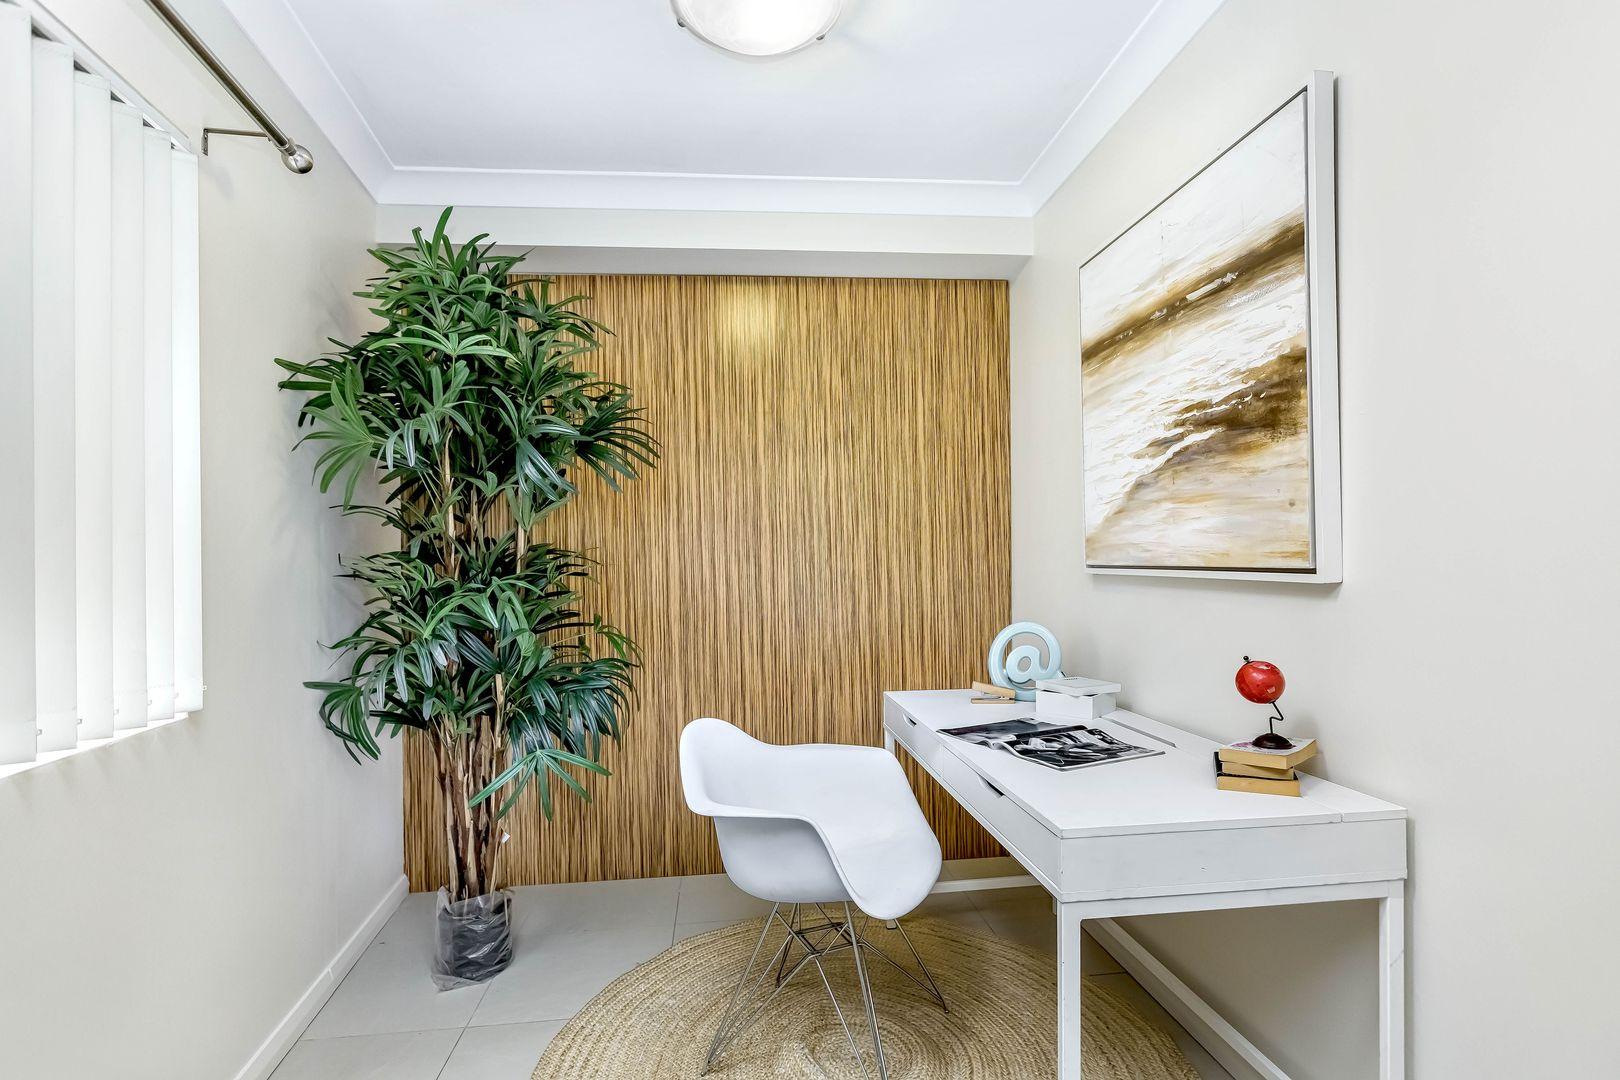 1/19 Anselm Street, Strathfield South NSW 2136, Image 2